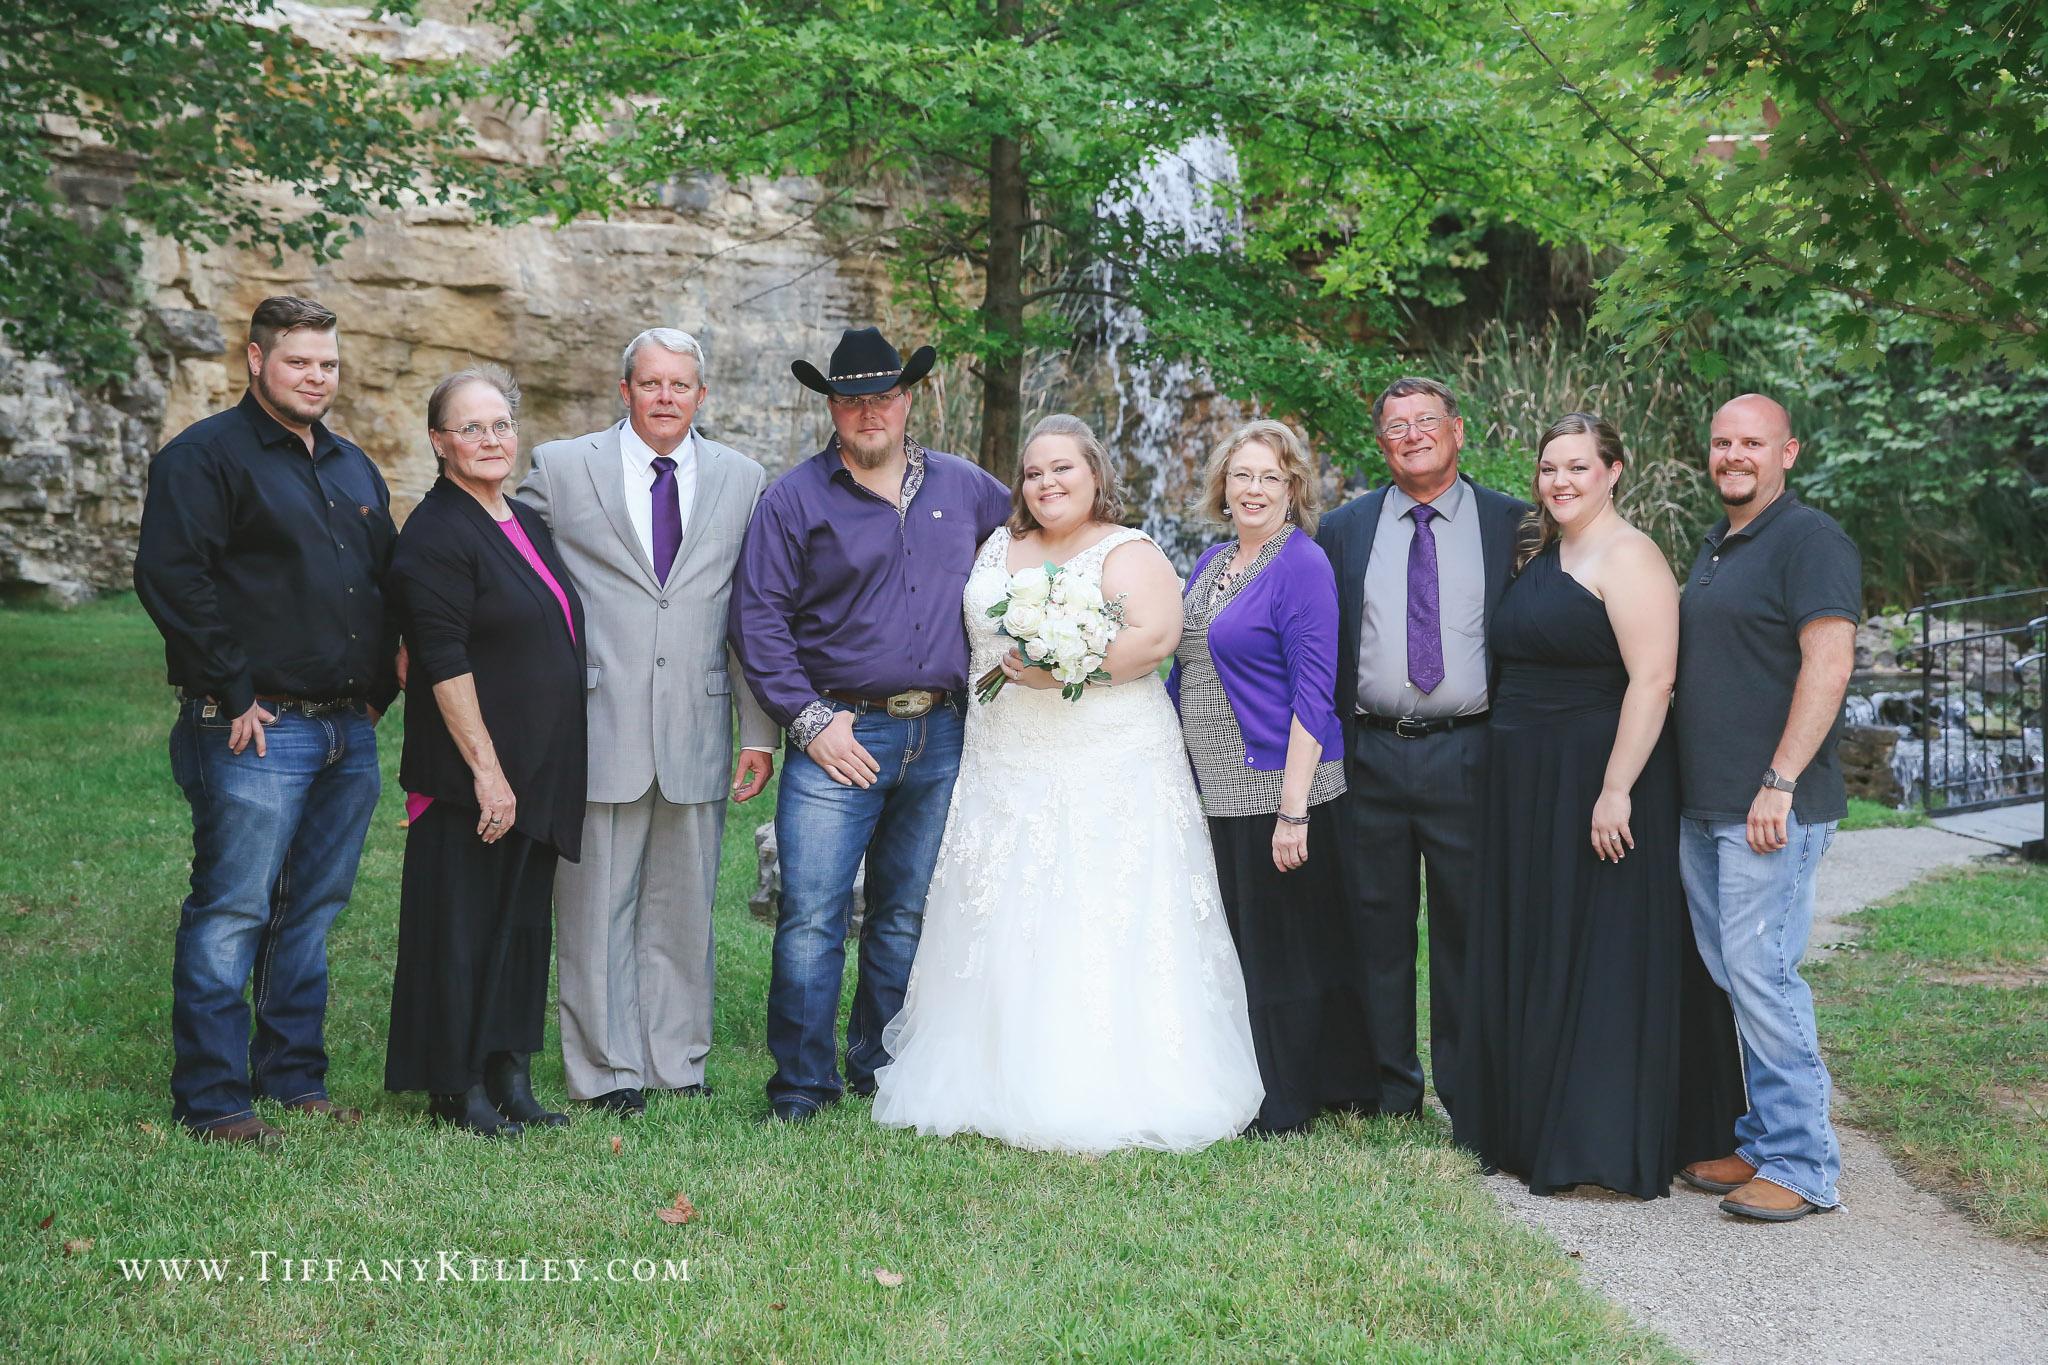 branson-missouri-big-cedar-lodge-wedding-photographer-tiffany-kelley-photography-11